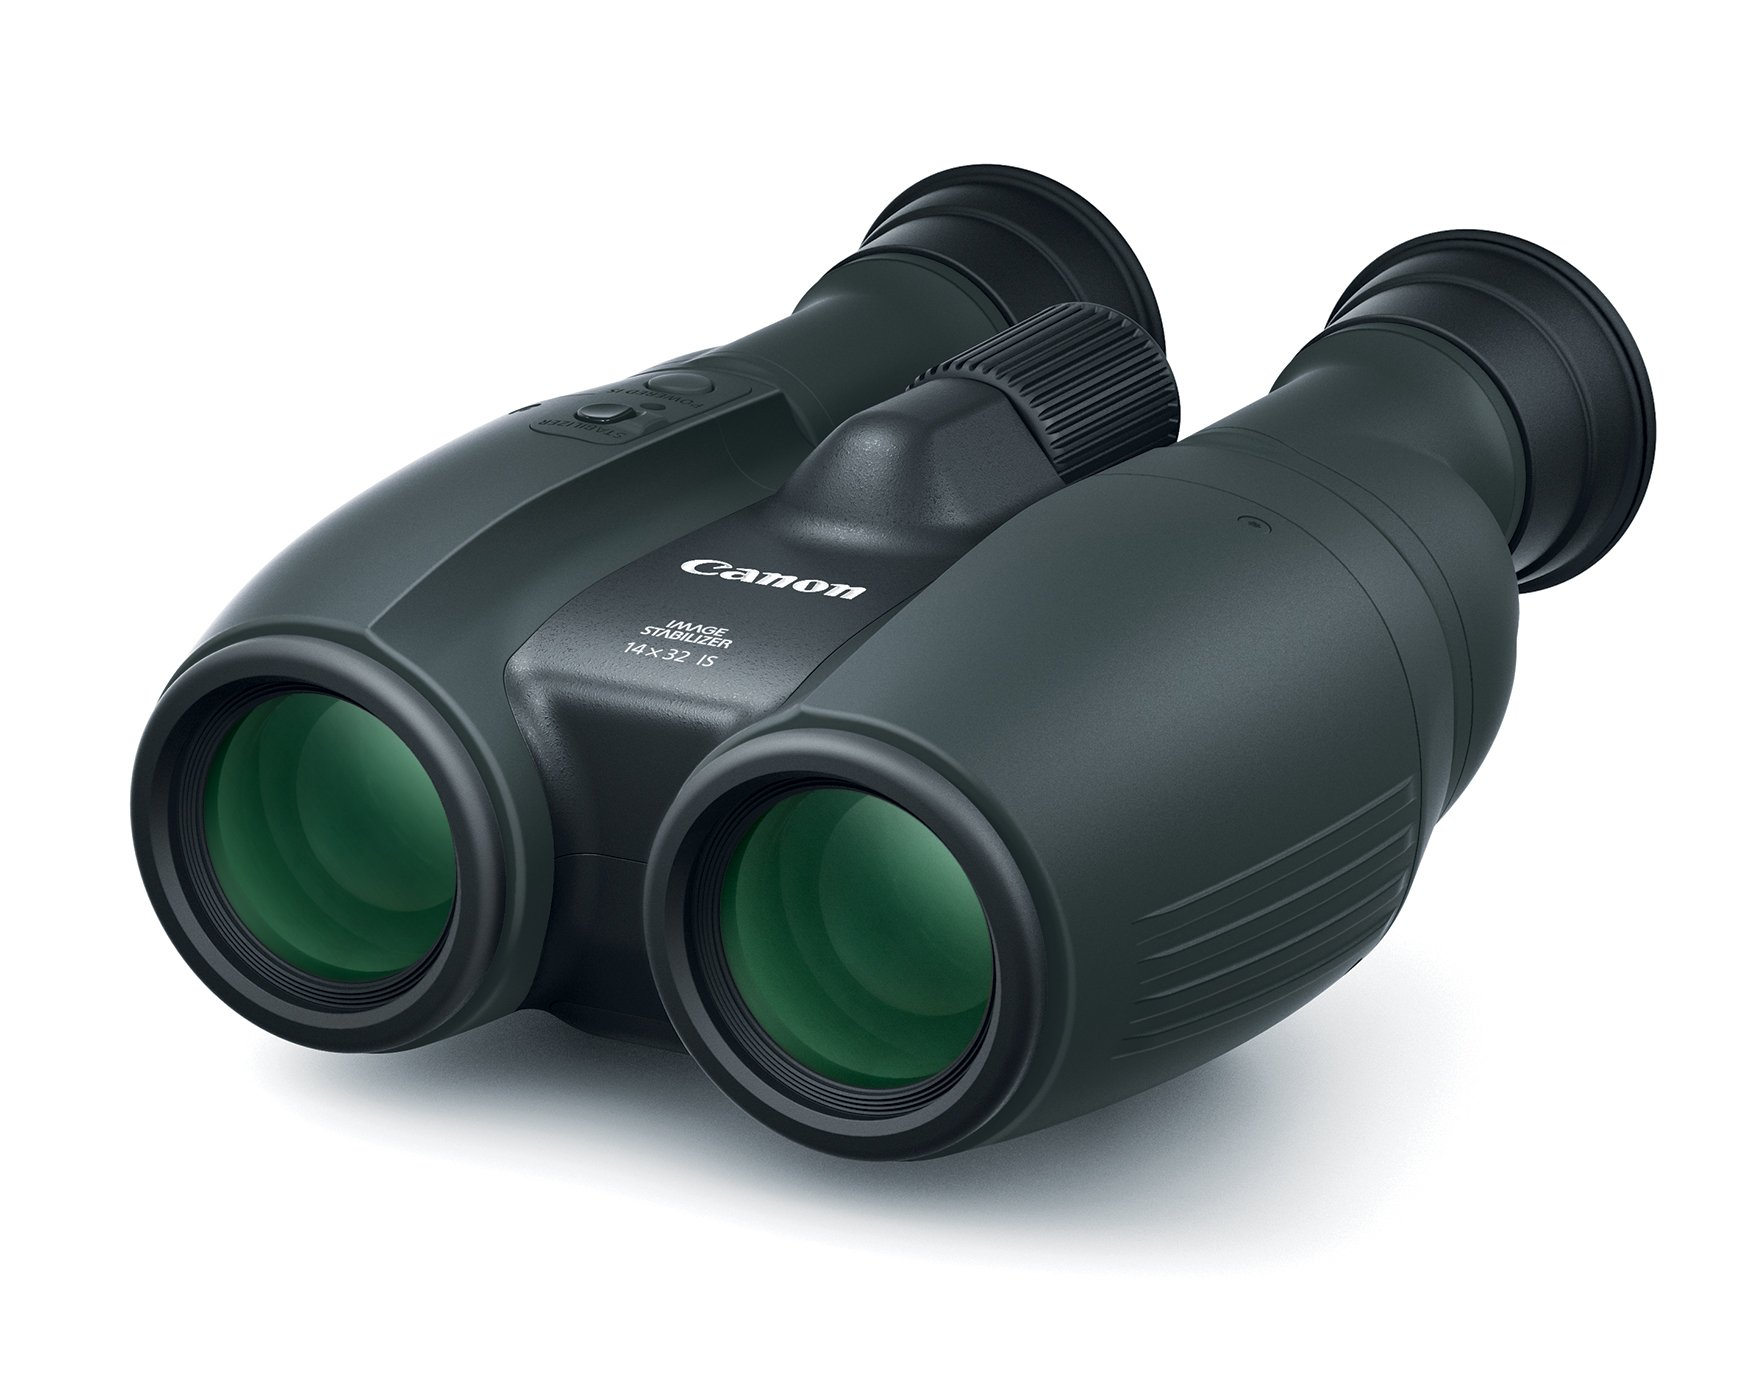 Canon Cameras US 14X32 is Image Stabilizing Binocular